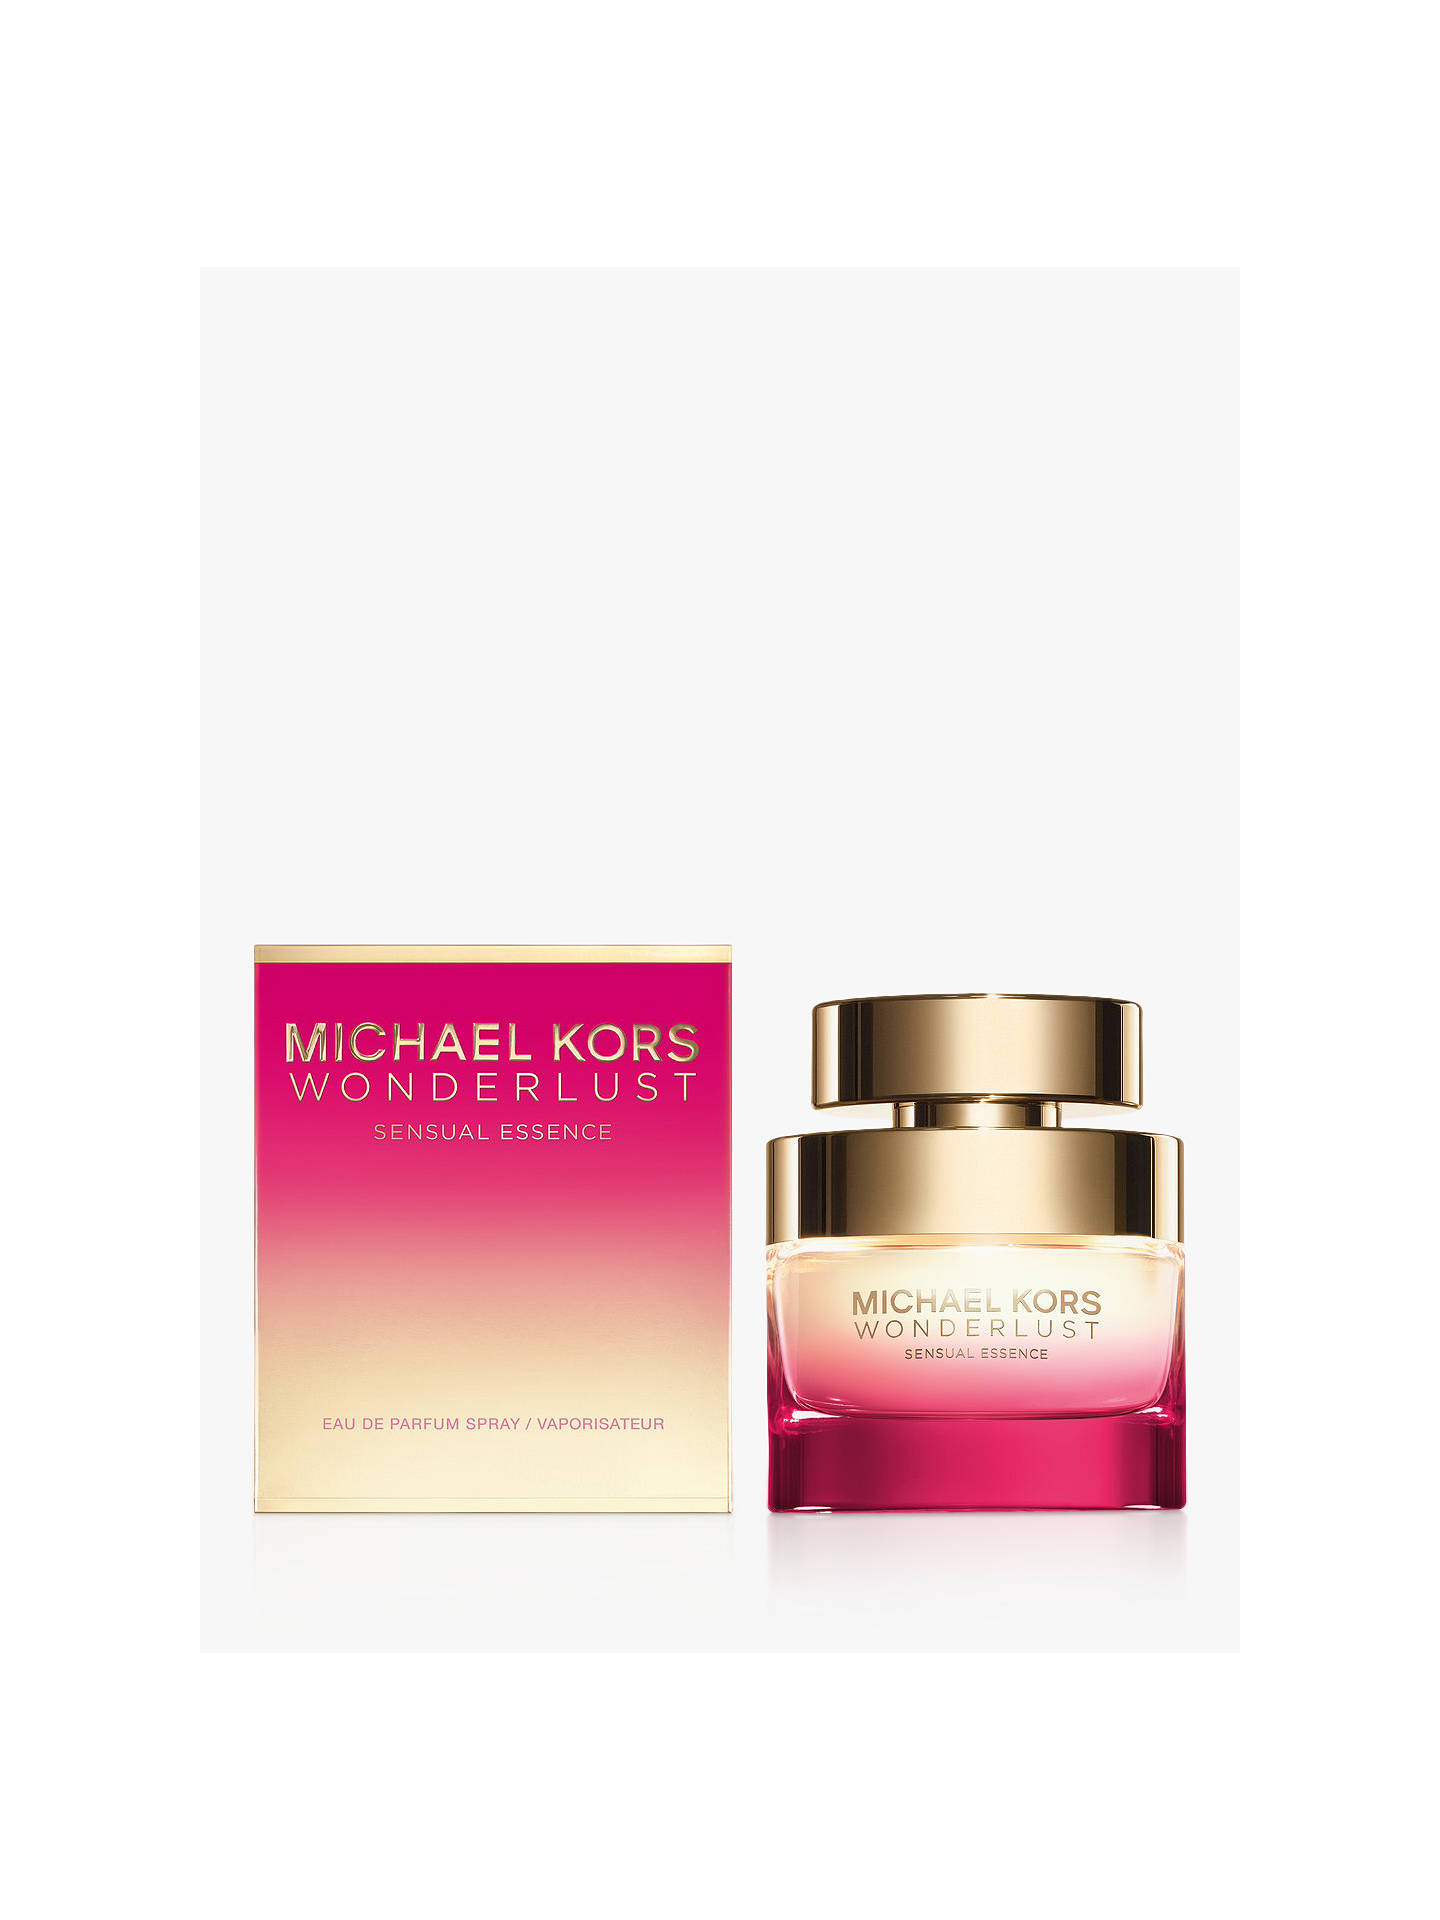 c698a08d83db Michael Kors Wonderlust Sensual Essence Eau de Parfum at John Lewis ...